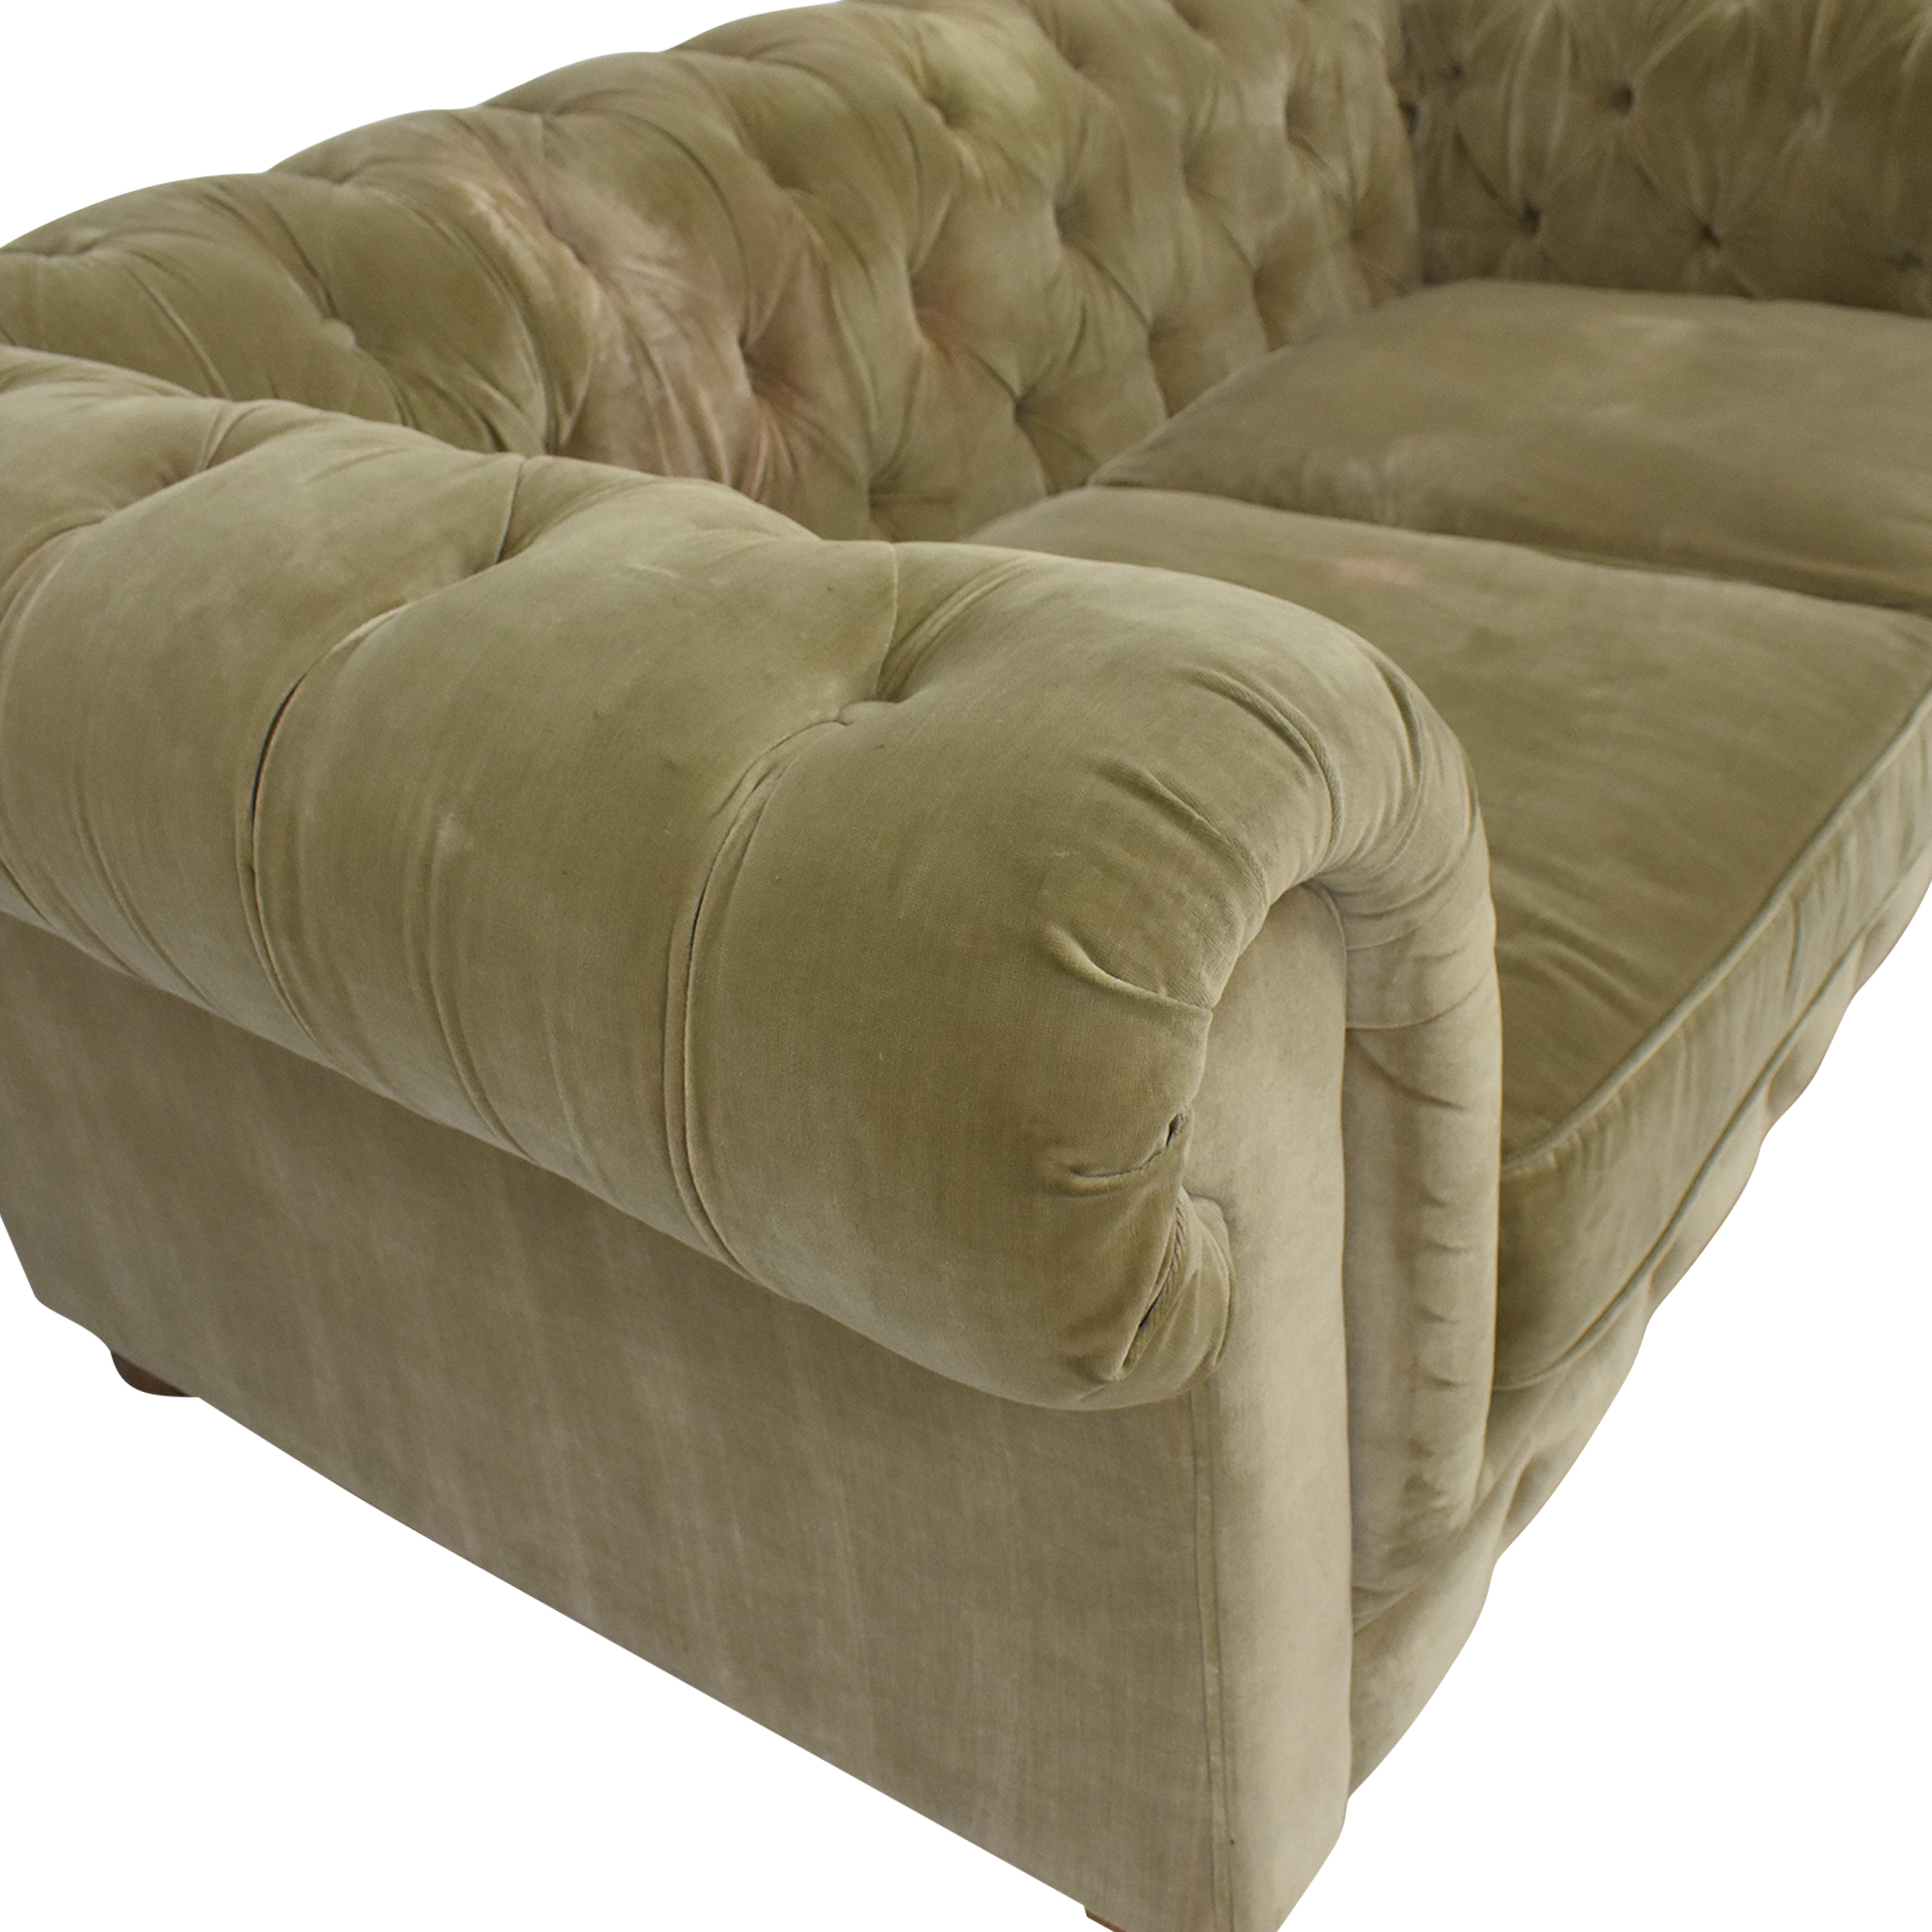 Restoration Hardware Kensington Sofa sale